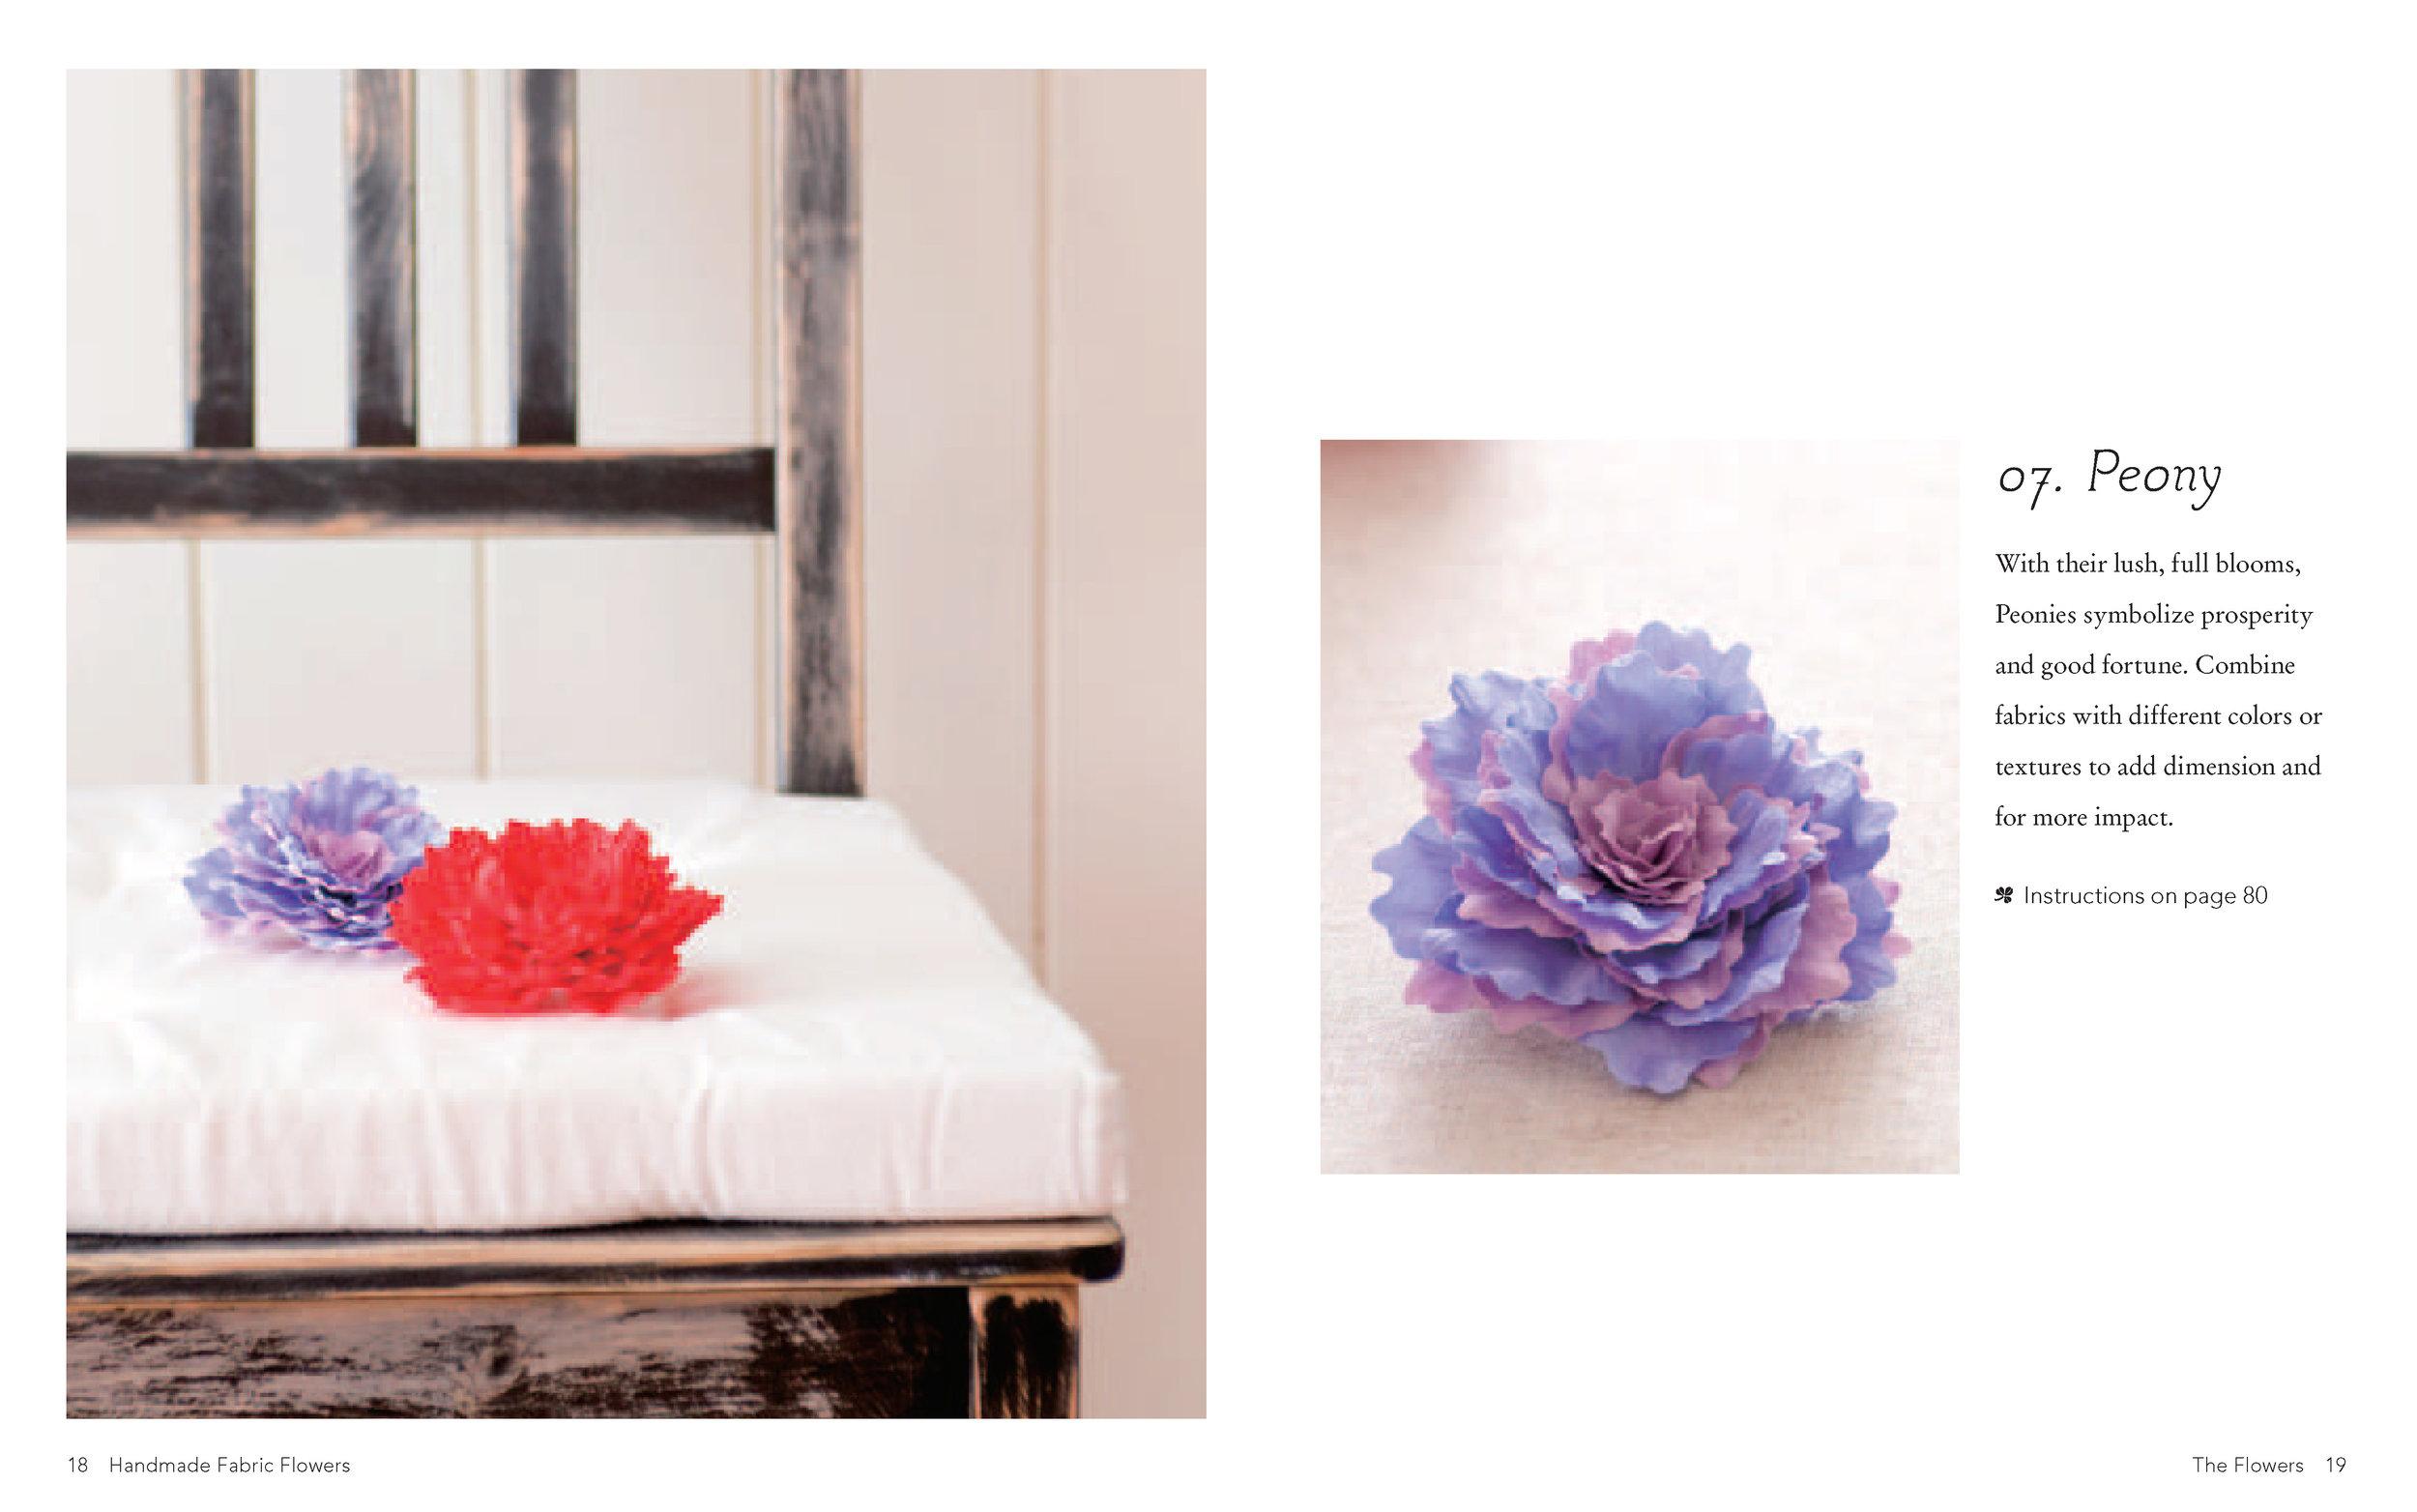 Handmade Fabric Flowers 18.19.jpg